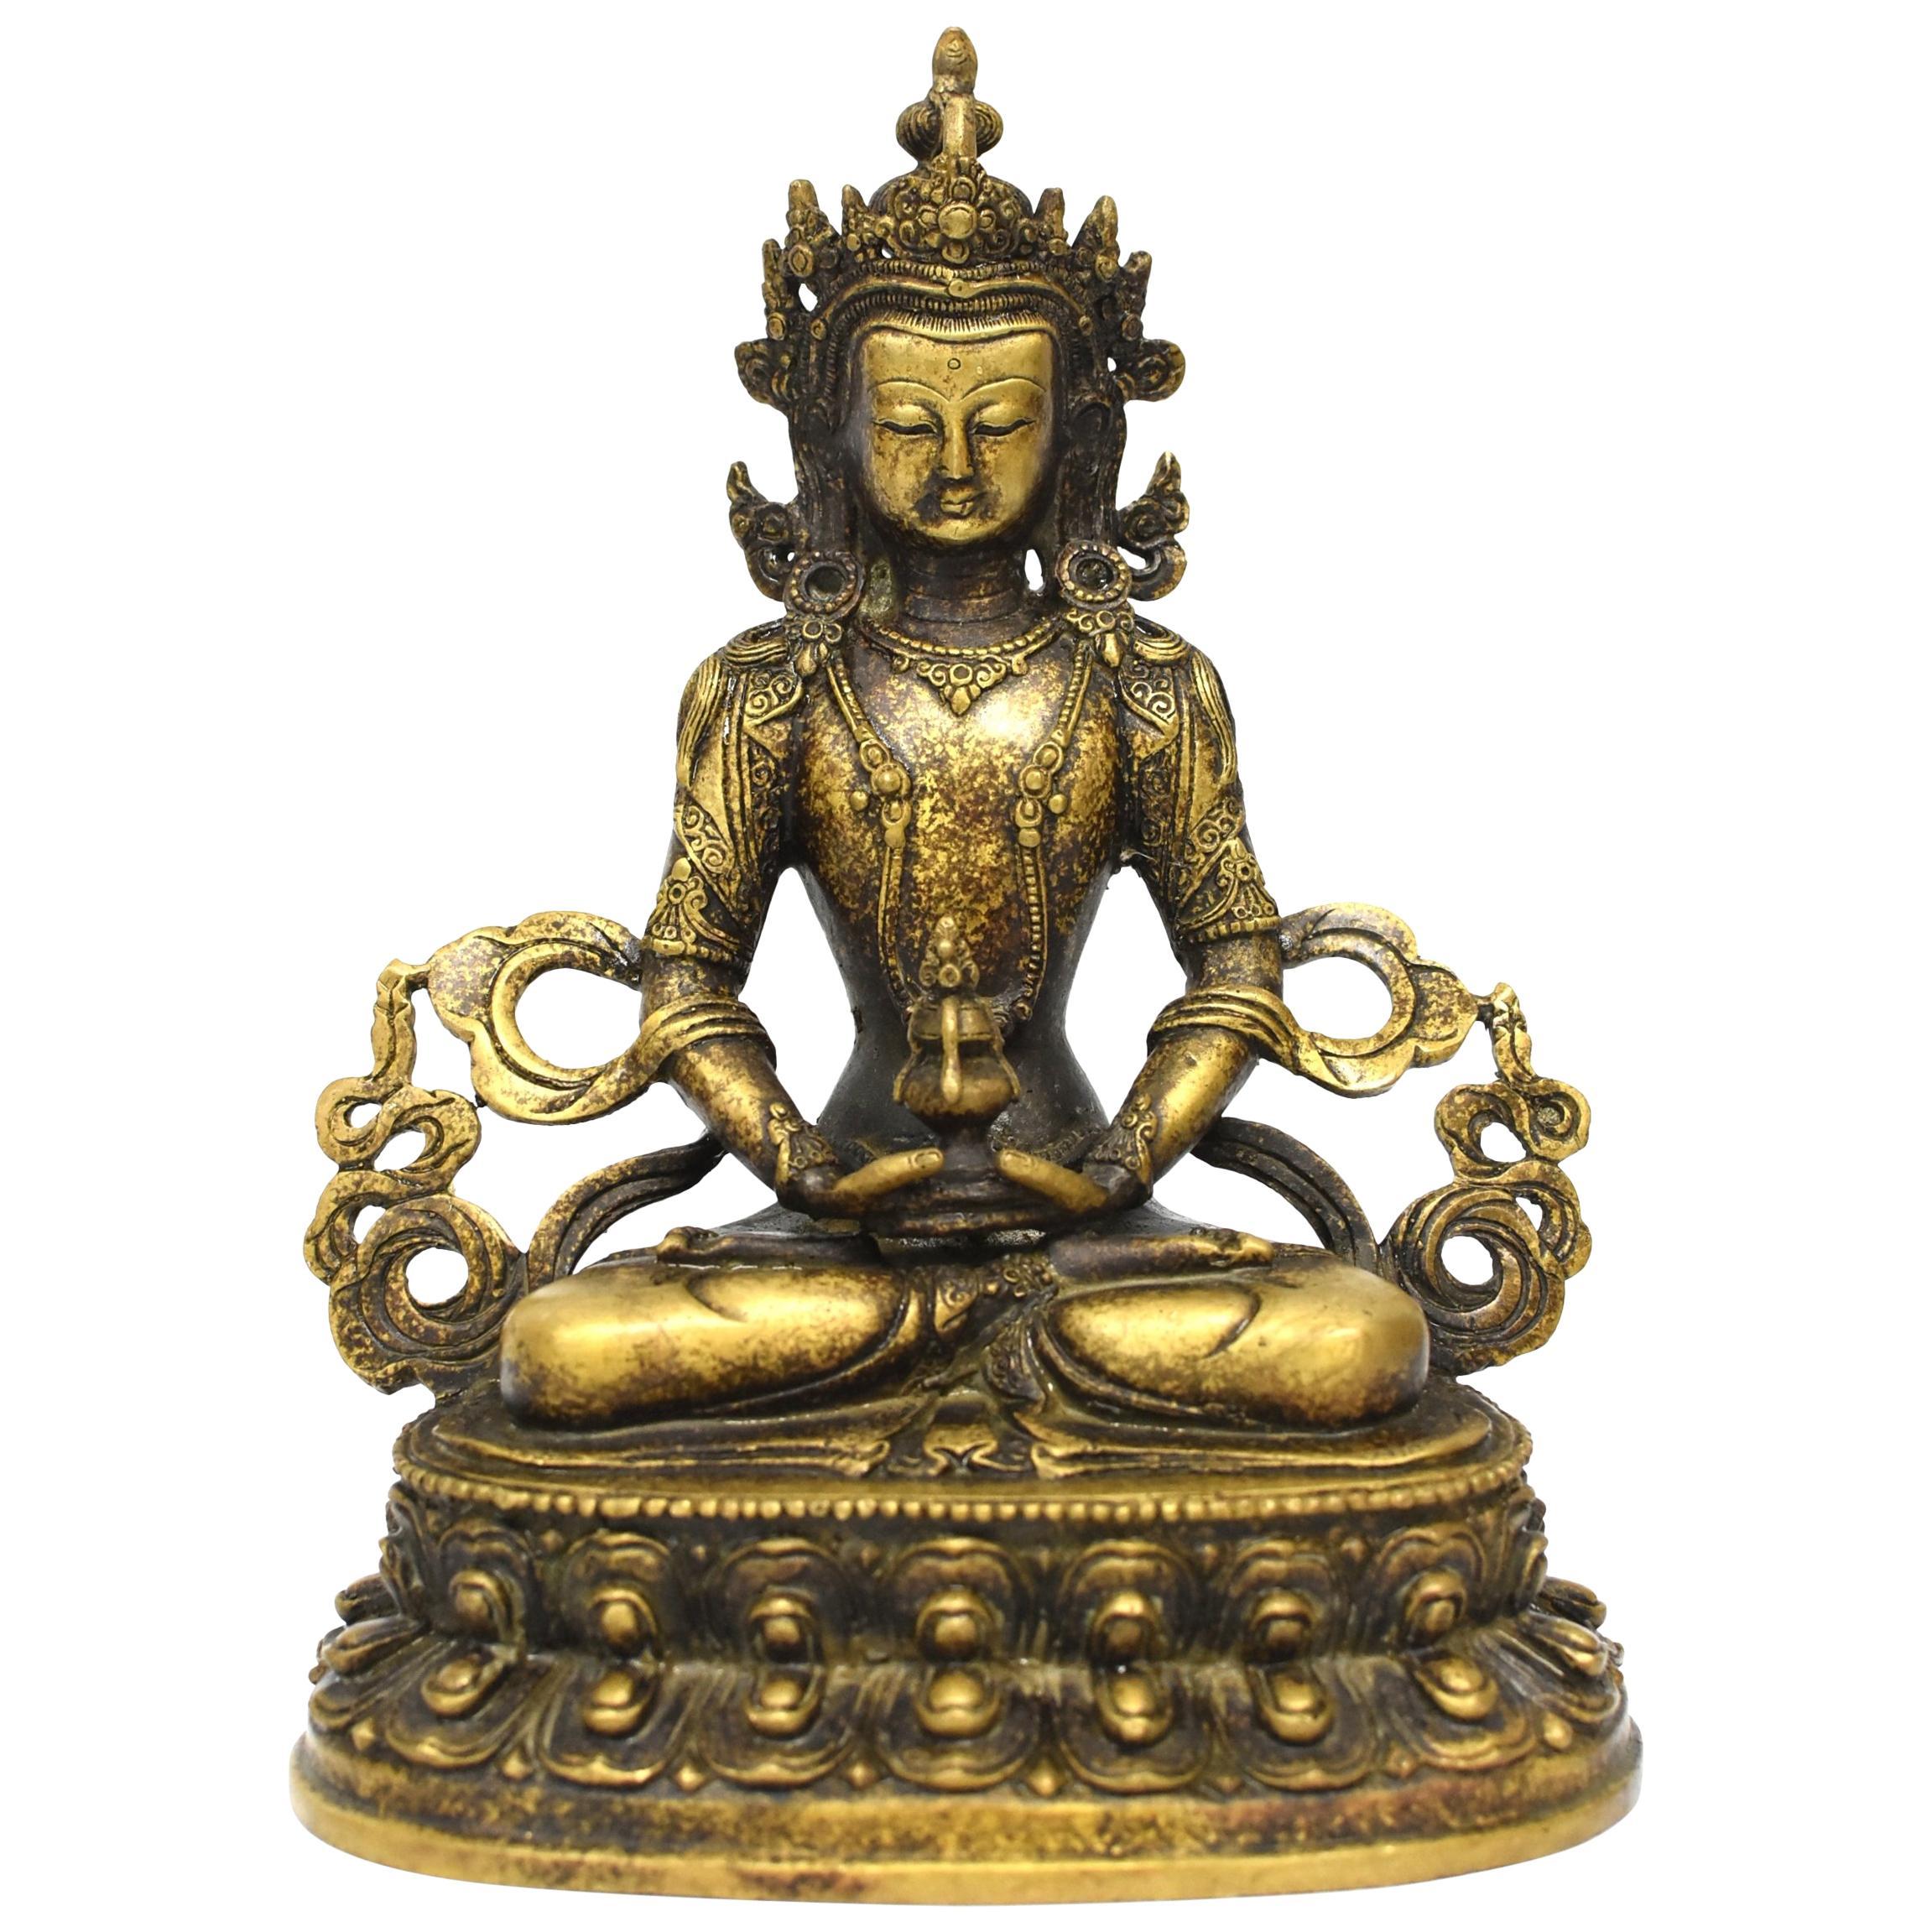 Tibetan Amitayus Buddha for Immortality Mottled Gold Finish